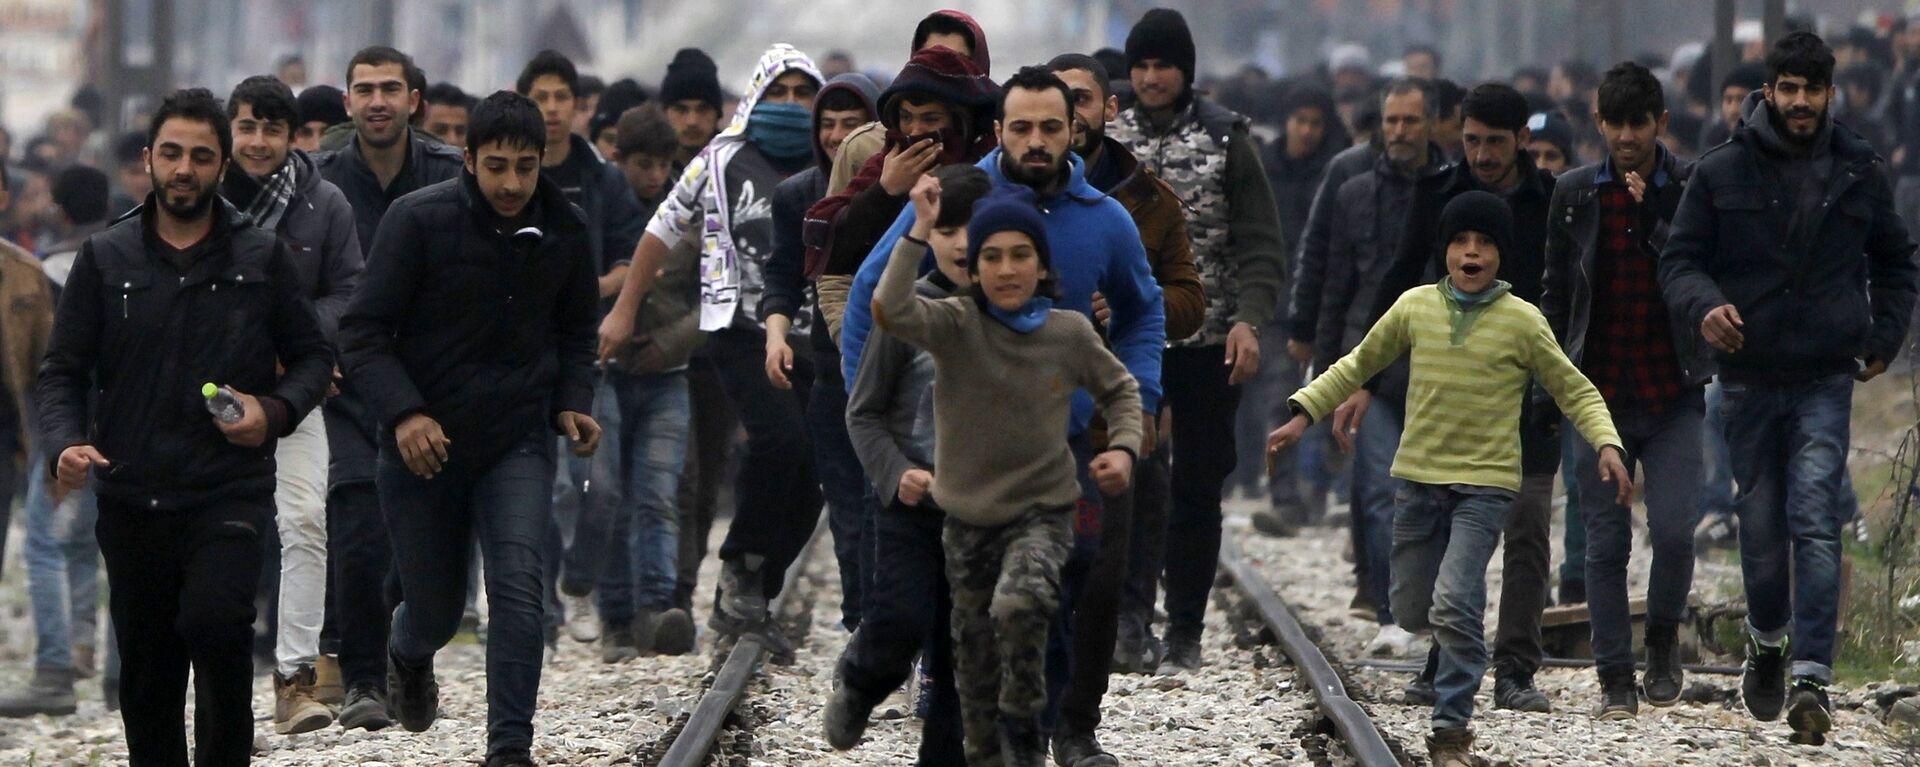 Migranci na grecko-macedońskiej granicy - Sputnik Polska, 1920, 04.10.2021